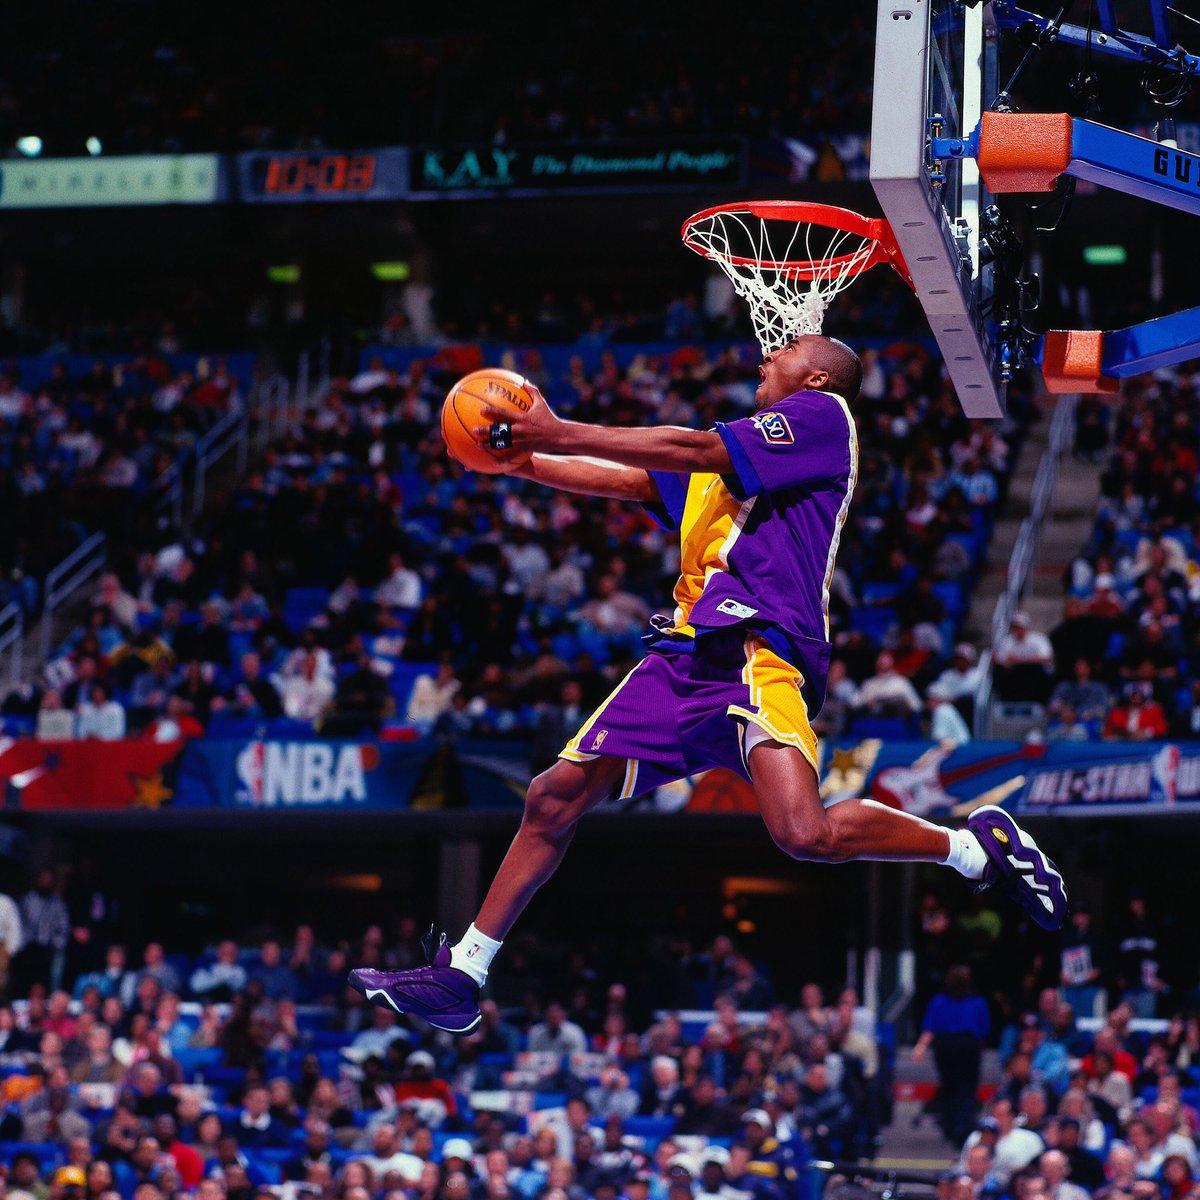 Cleveland #NBAAllStar 1997 #TBT...  18-year-old @kobebryant wins the 1997 Slam Dunk Contest!